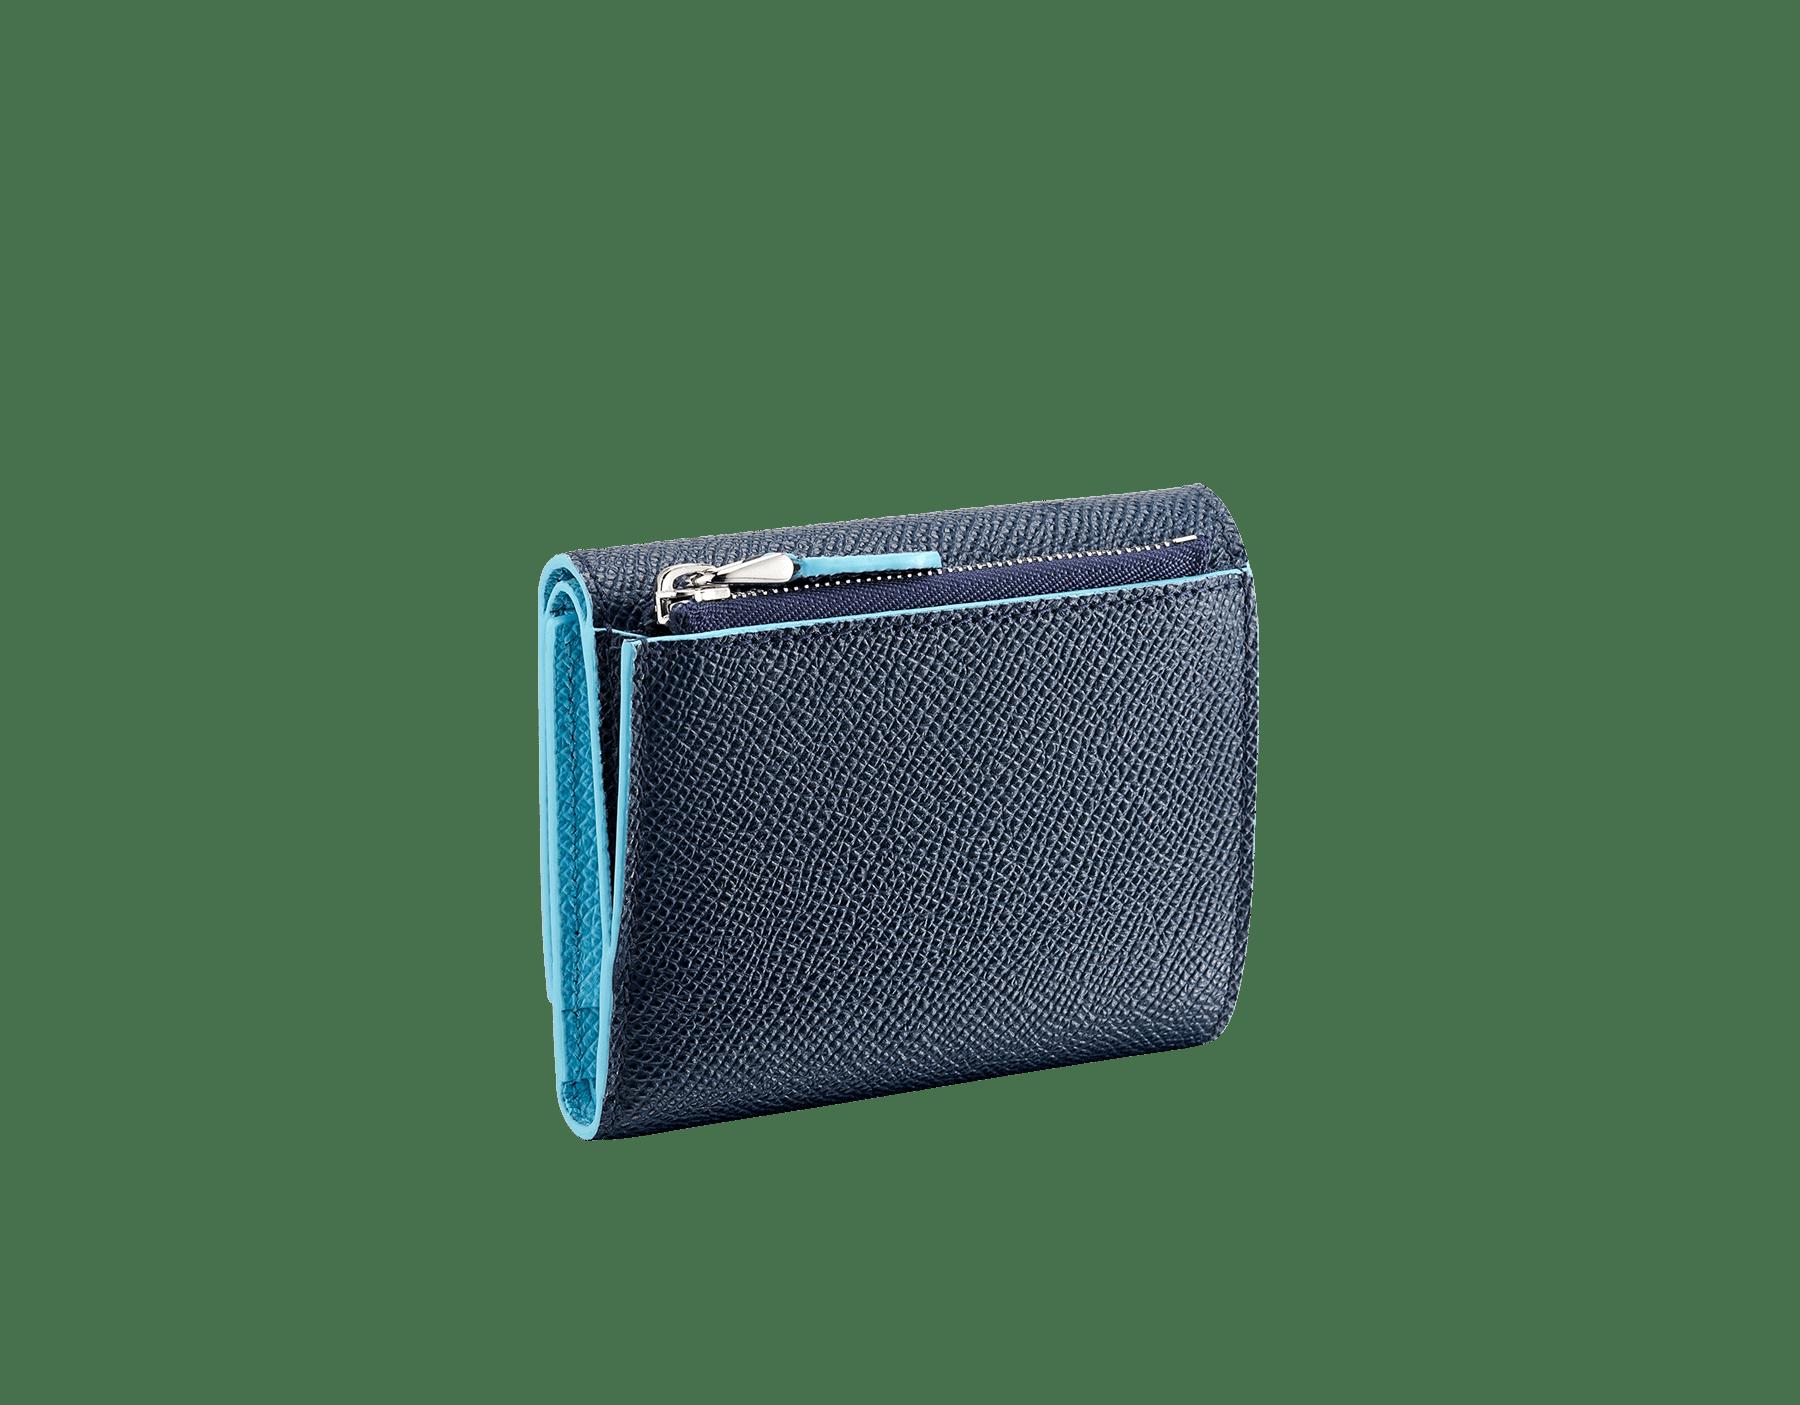 """Bvlgari Clip"" slim compact wallet in Denim Sapphire blue and Aegean Topaz light blue grained calfskin. Iconiclogo clip closure in palladium-plated brass BCM-SLIMCOMPACTa image 3"